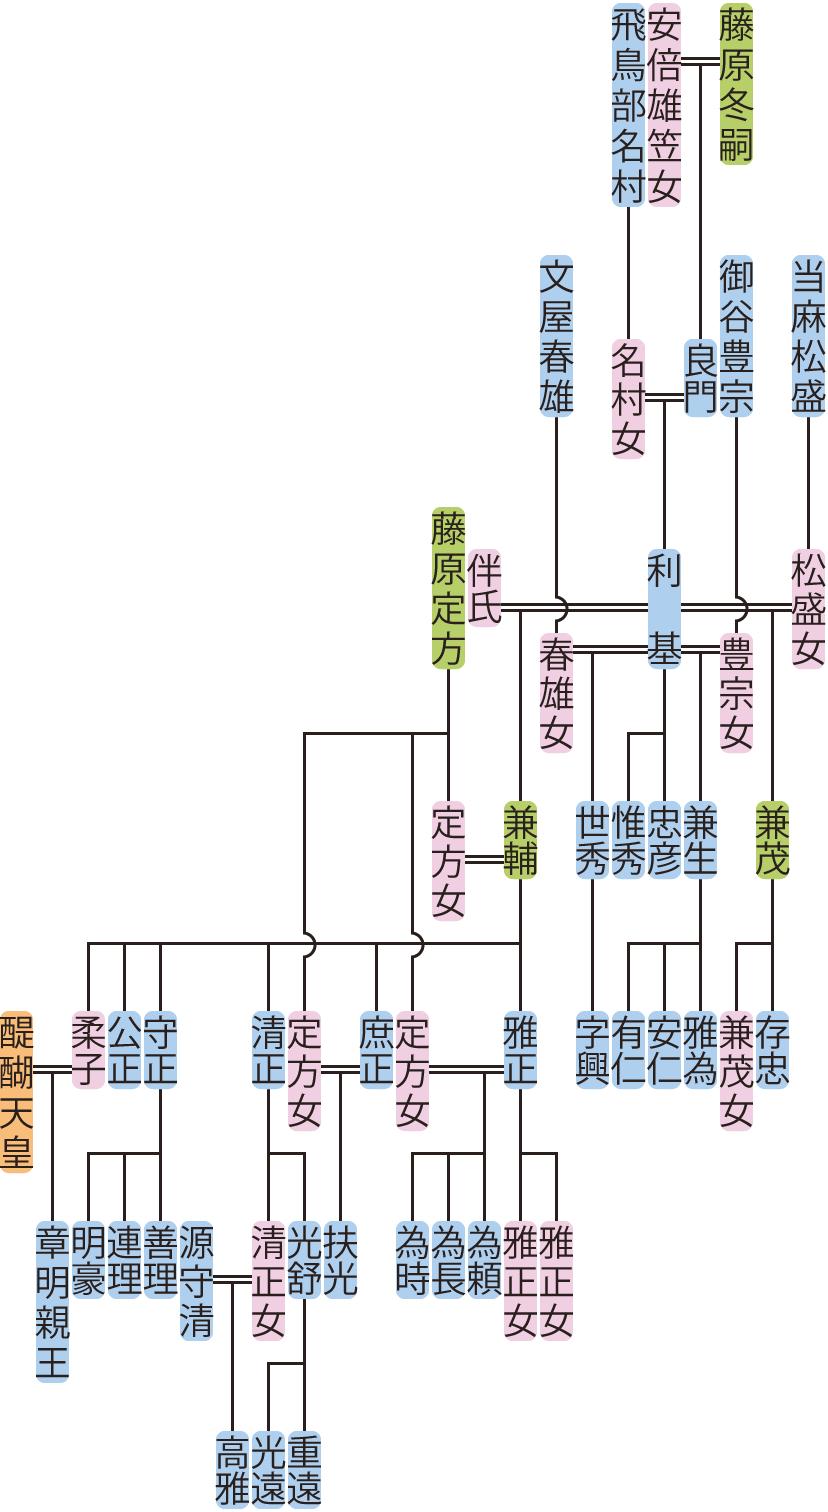 藤原利基・兼輔の系図